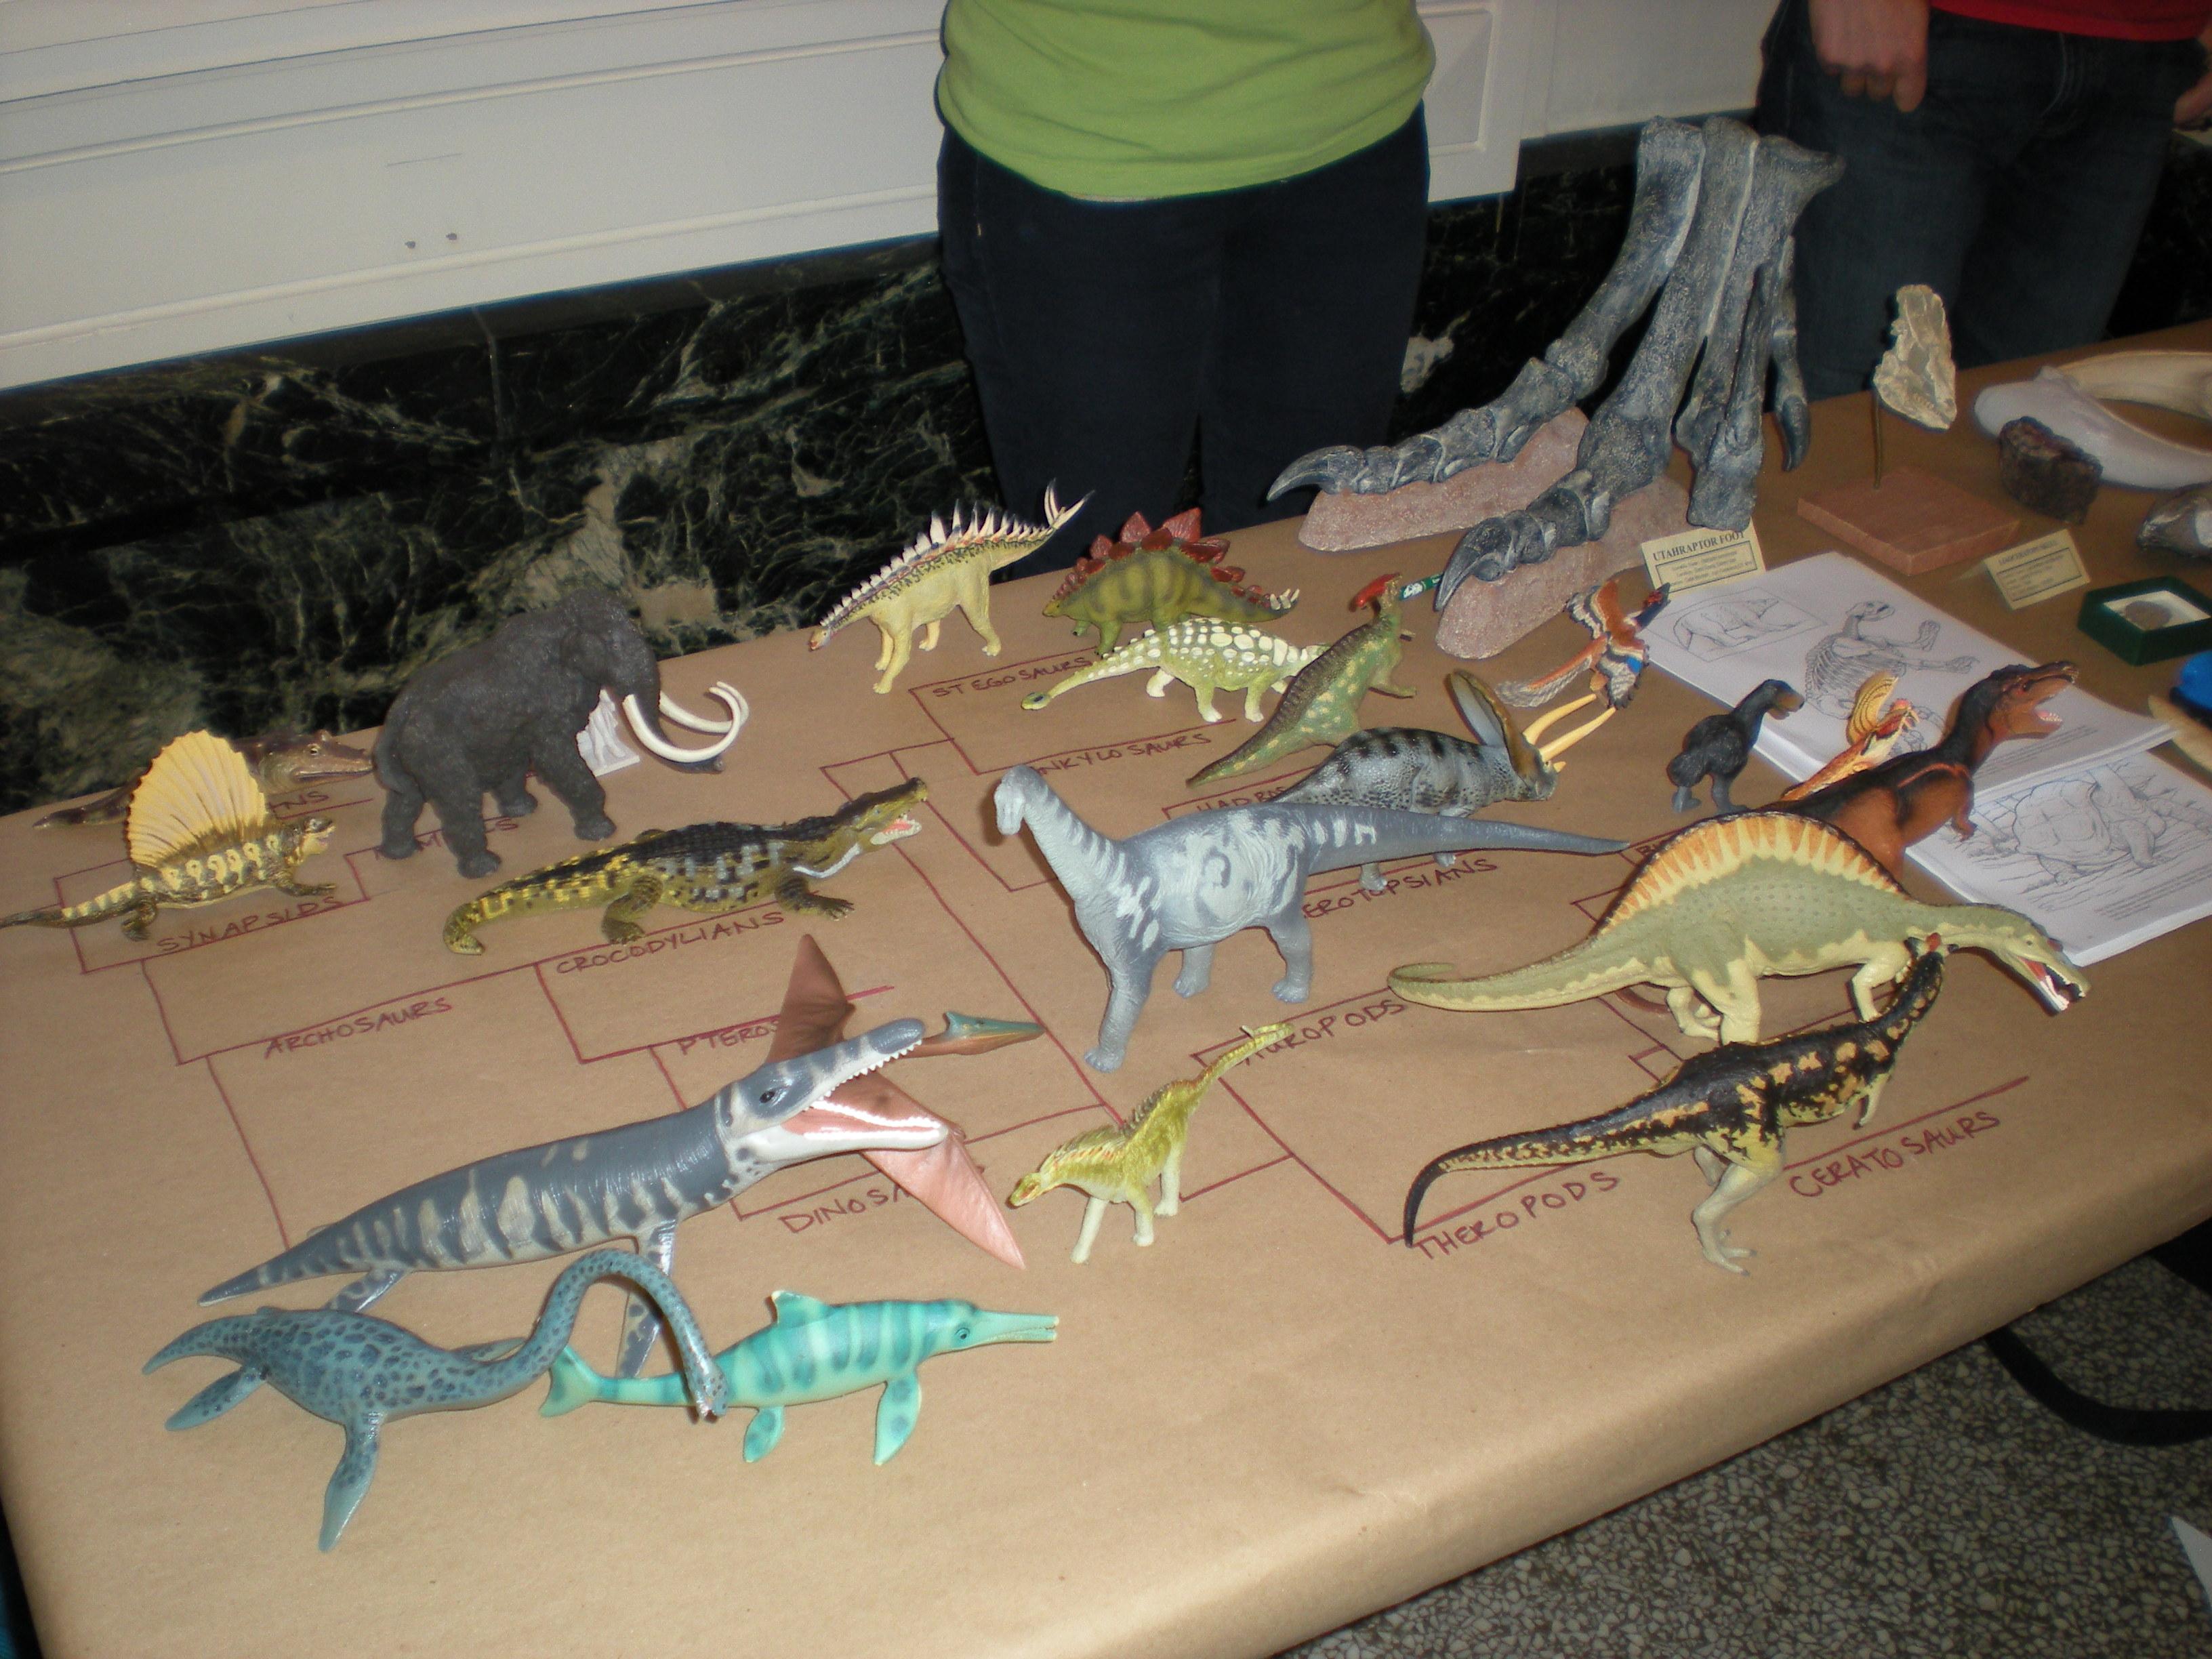 The pyhlogeny of plastic animals.